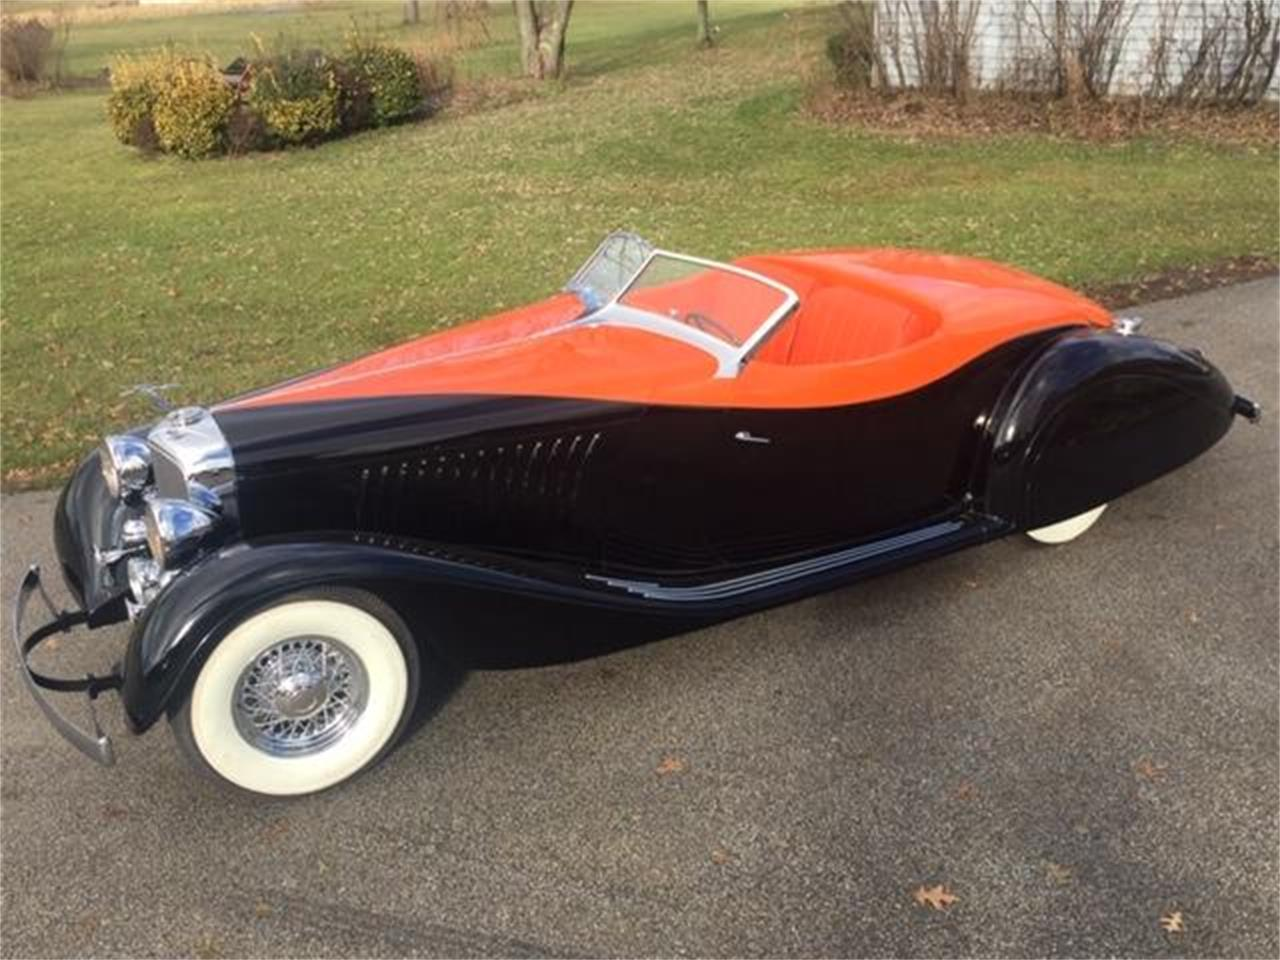 1936 Duesenberg Replica (CC-1420949) for sale in Morgantown, PA19543